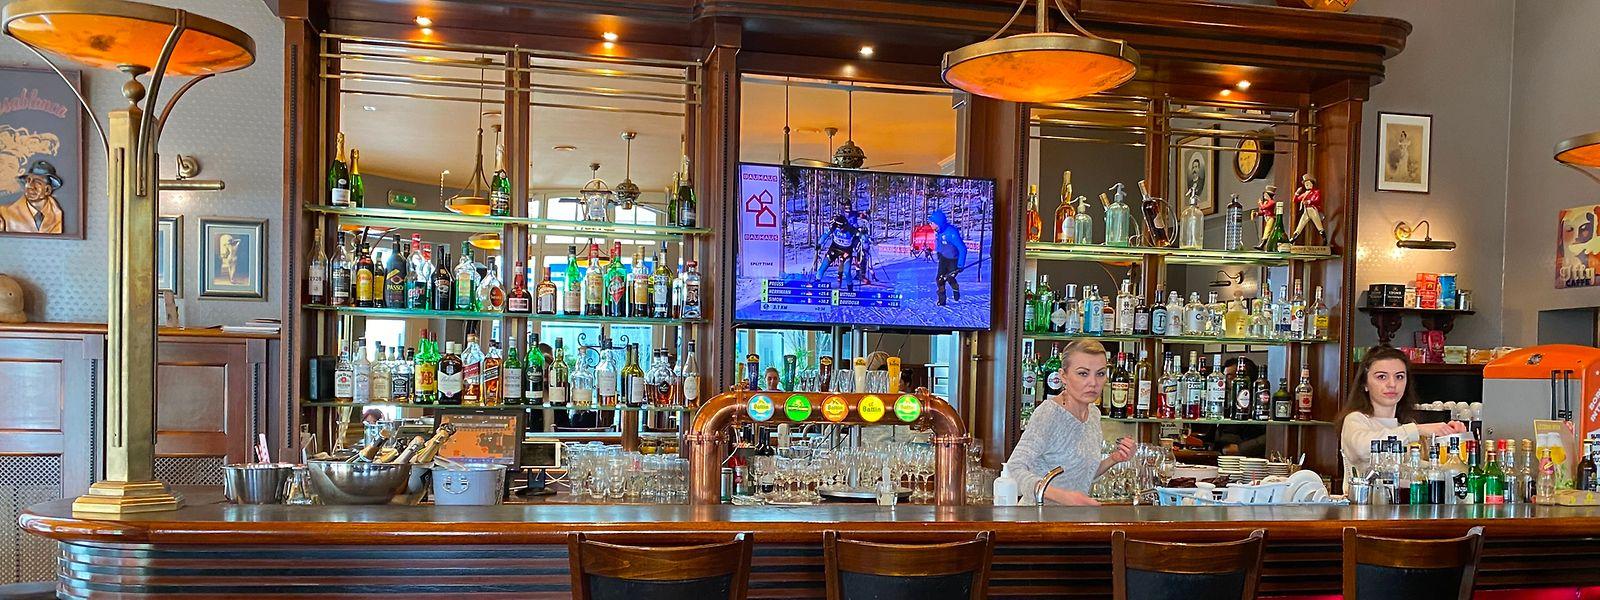 Ab Montag ist das Casablanca Café in der Rue de l'Alzette in Esch/Alzette geschlossen.